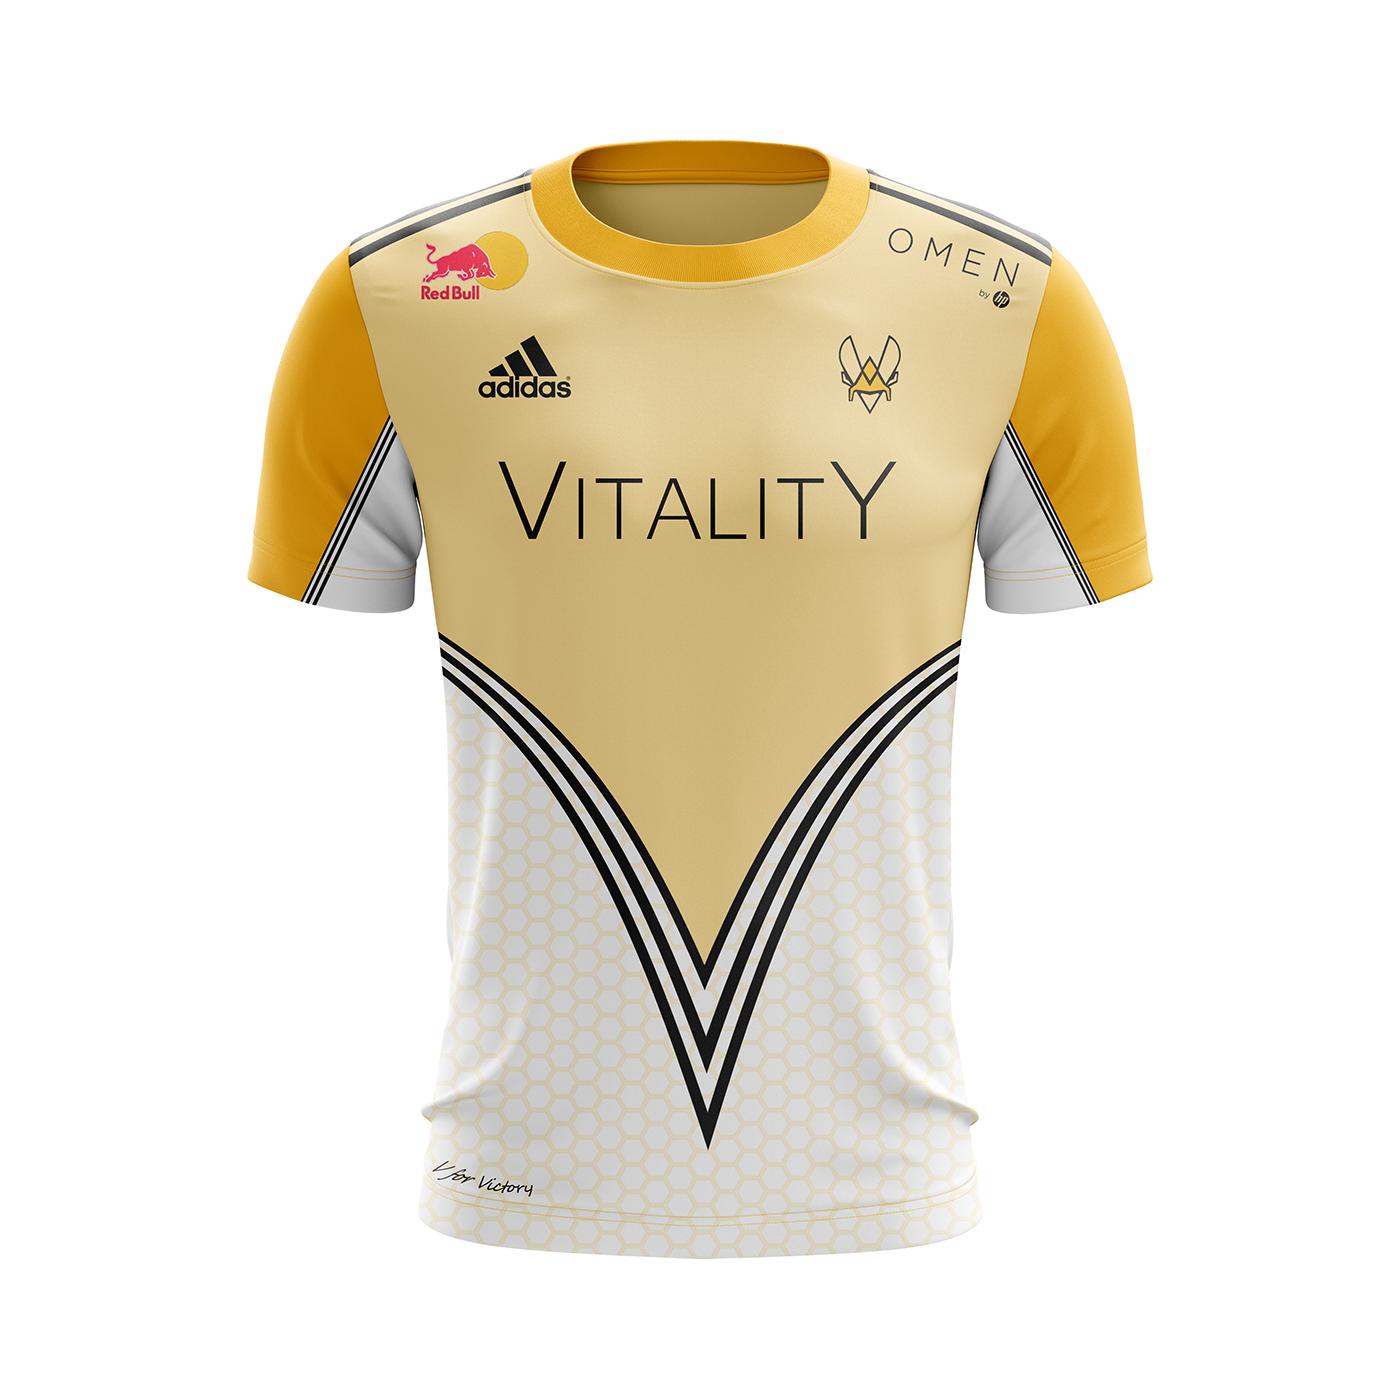 Yf7bgvi6y Vitality Concept On Behance Jersey Team tCsxQrdBh